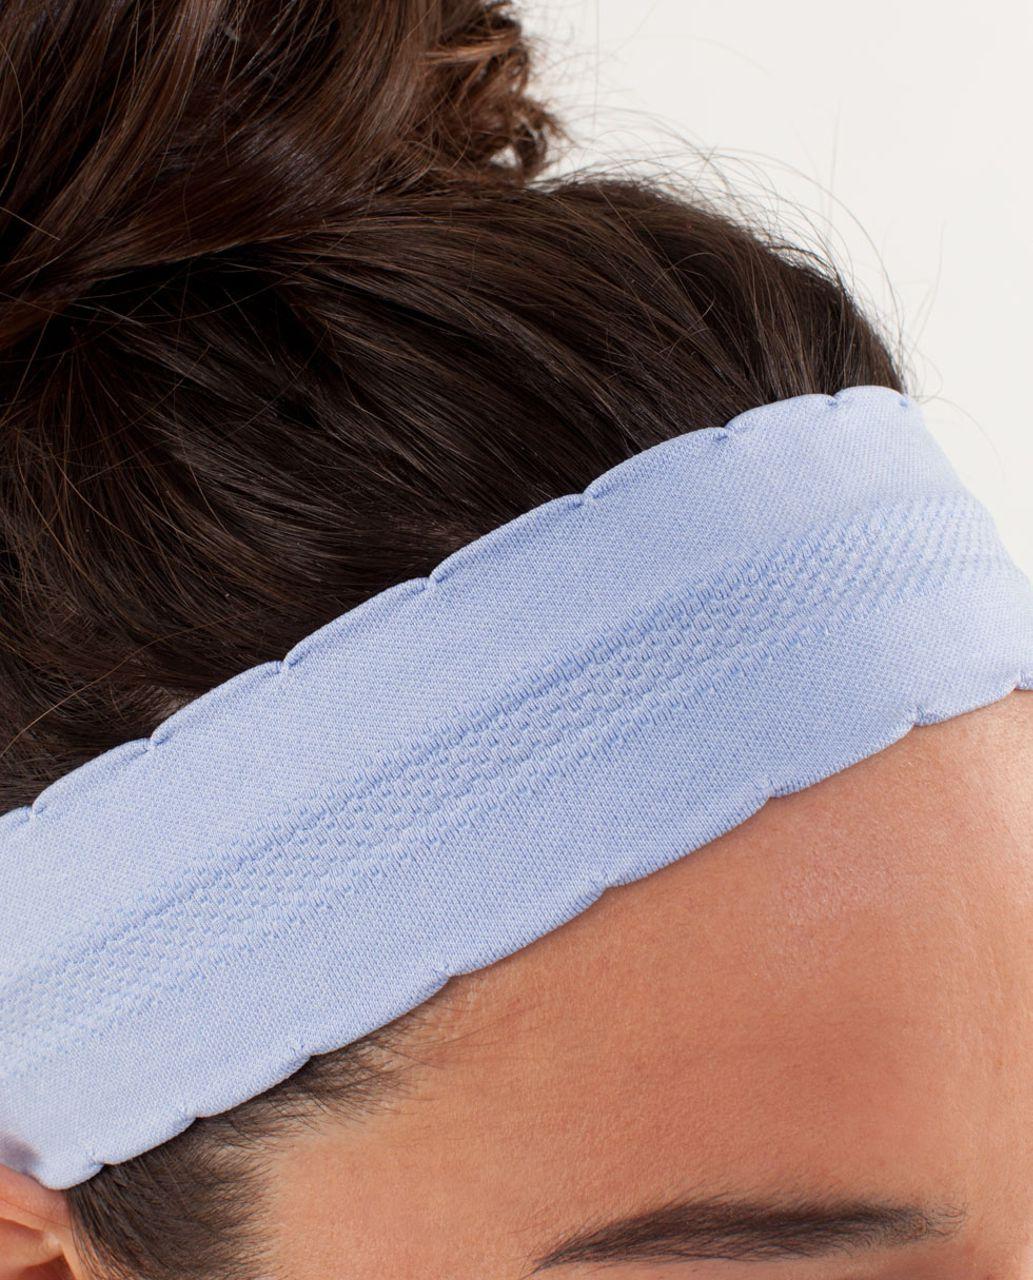 Lululemon Swiftly Headband - Polar Haze